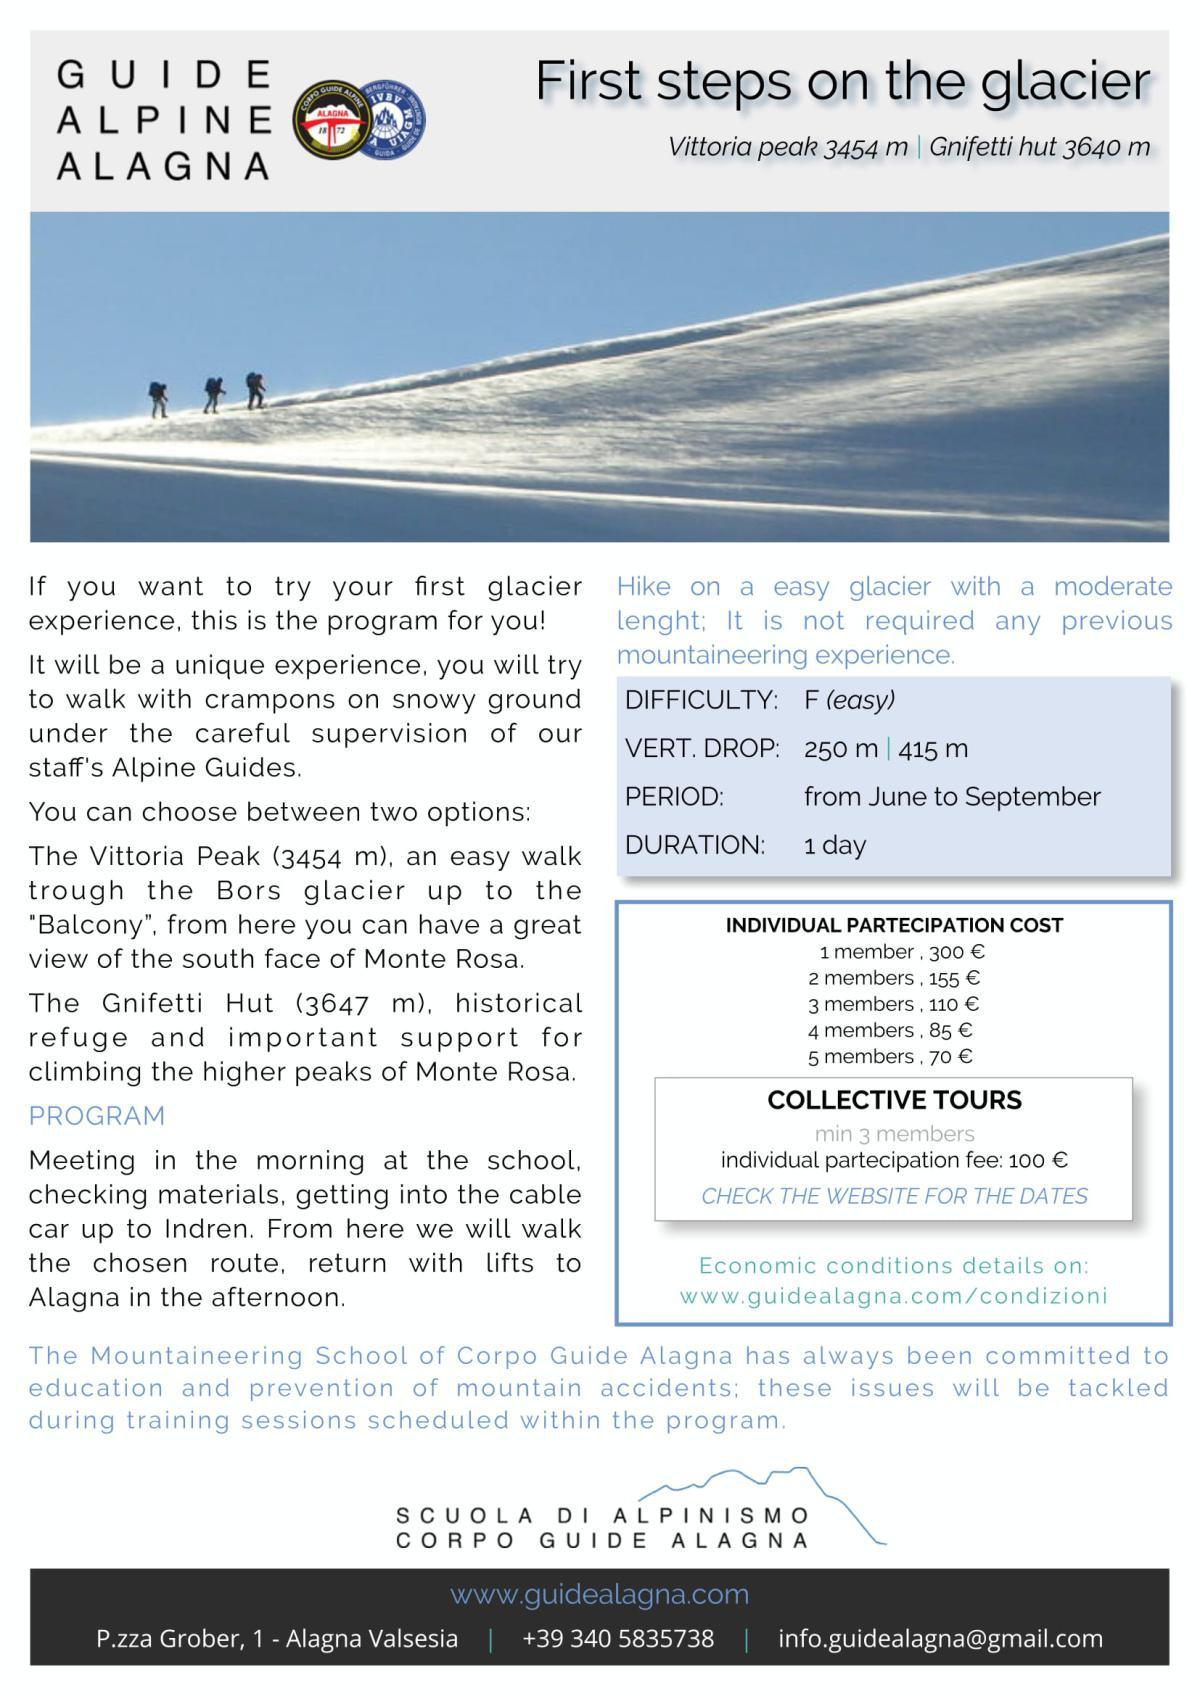 Primi passi sul ghiacciaio - Guide Alpine Alagna